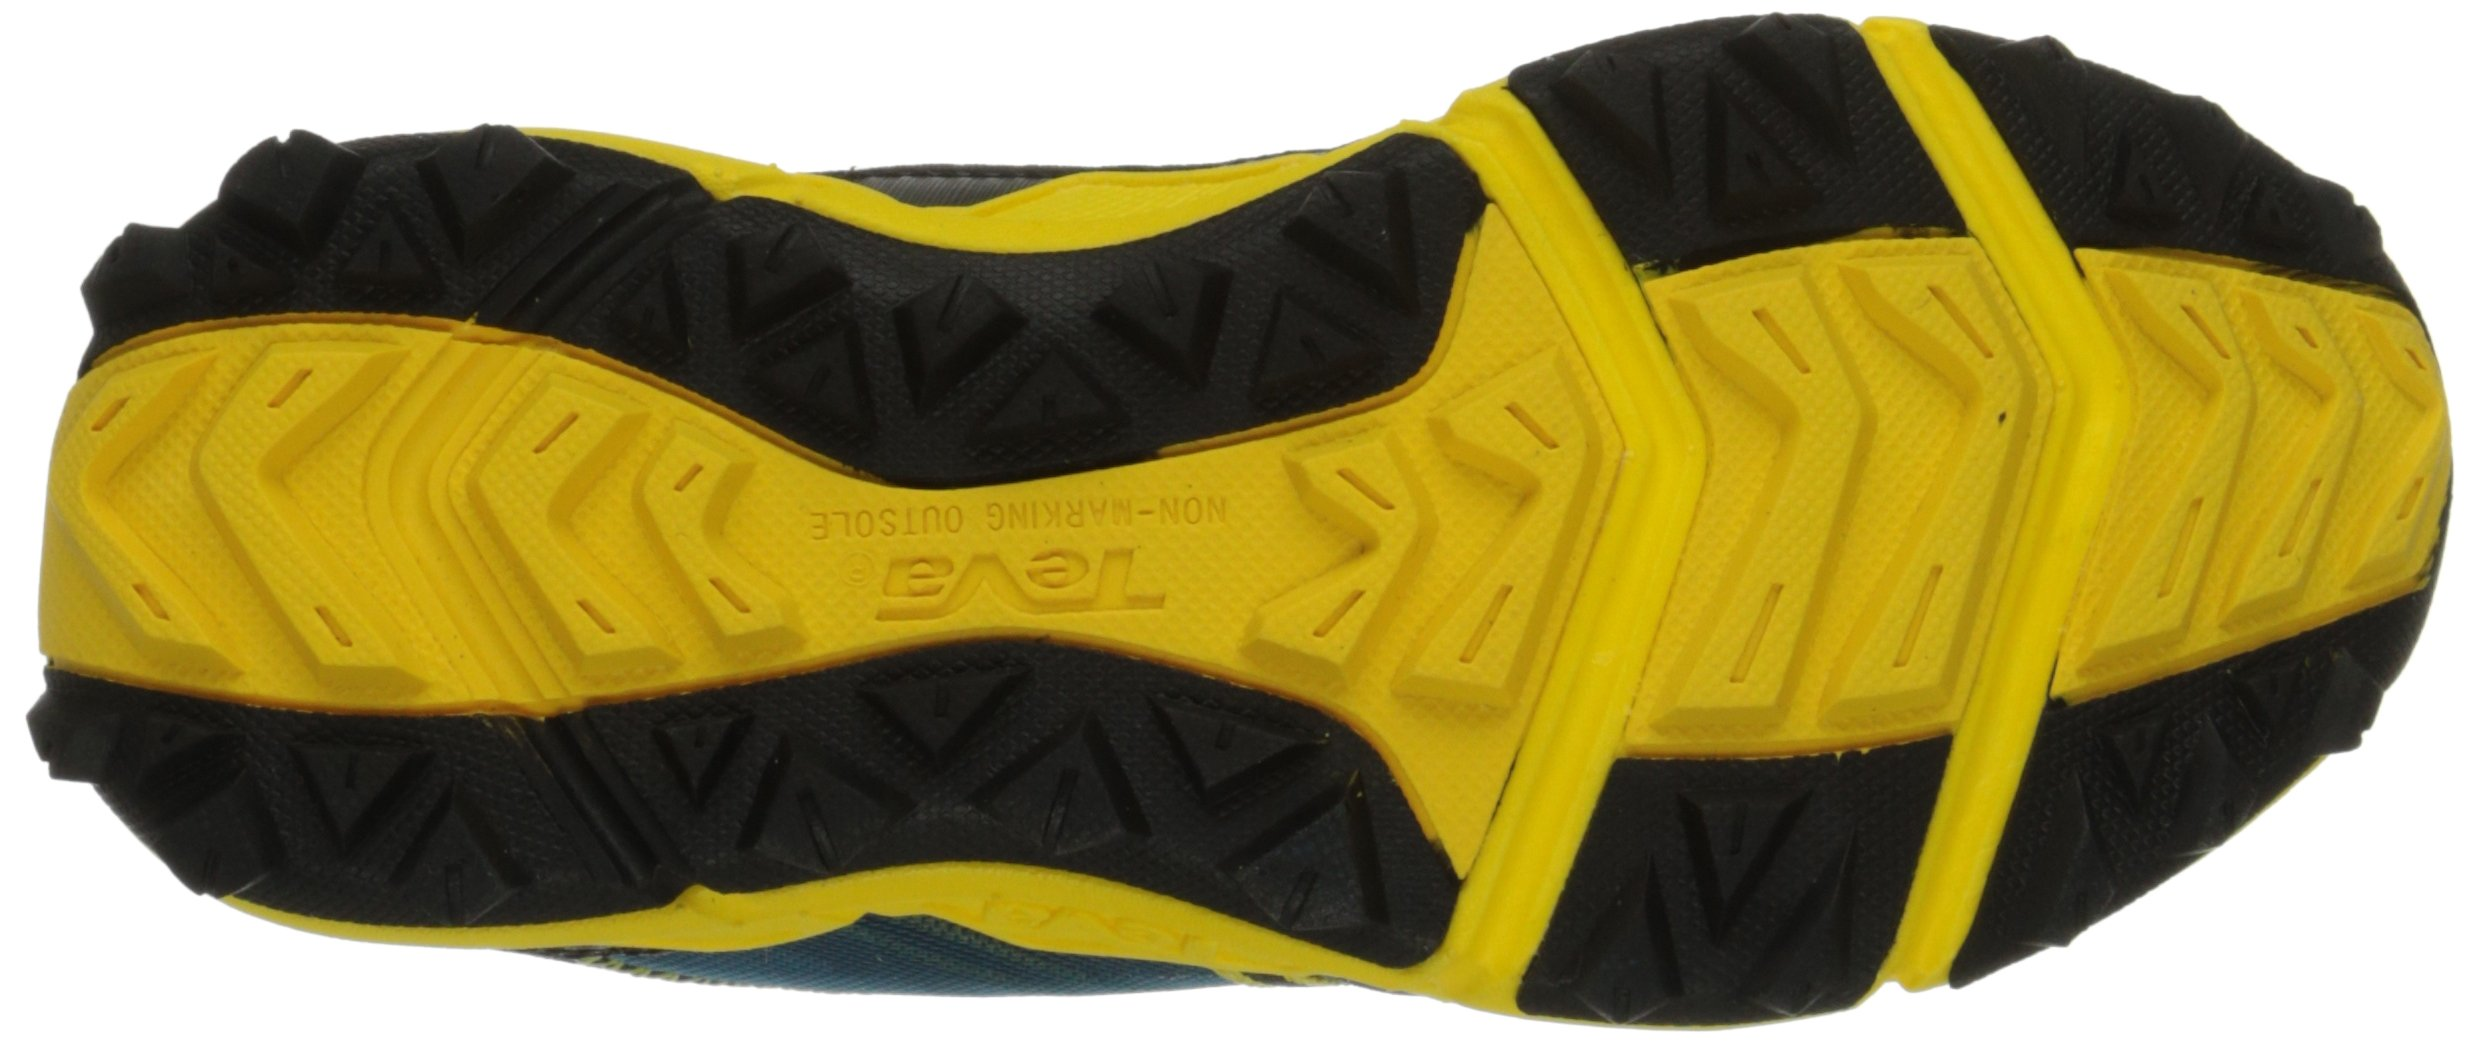 Teva Escapade Lo Athletic Trail Shoe (Little Kid/Big Kid), Blue/Yellow, 11 M US Little Kid by Teva (Image #3)